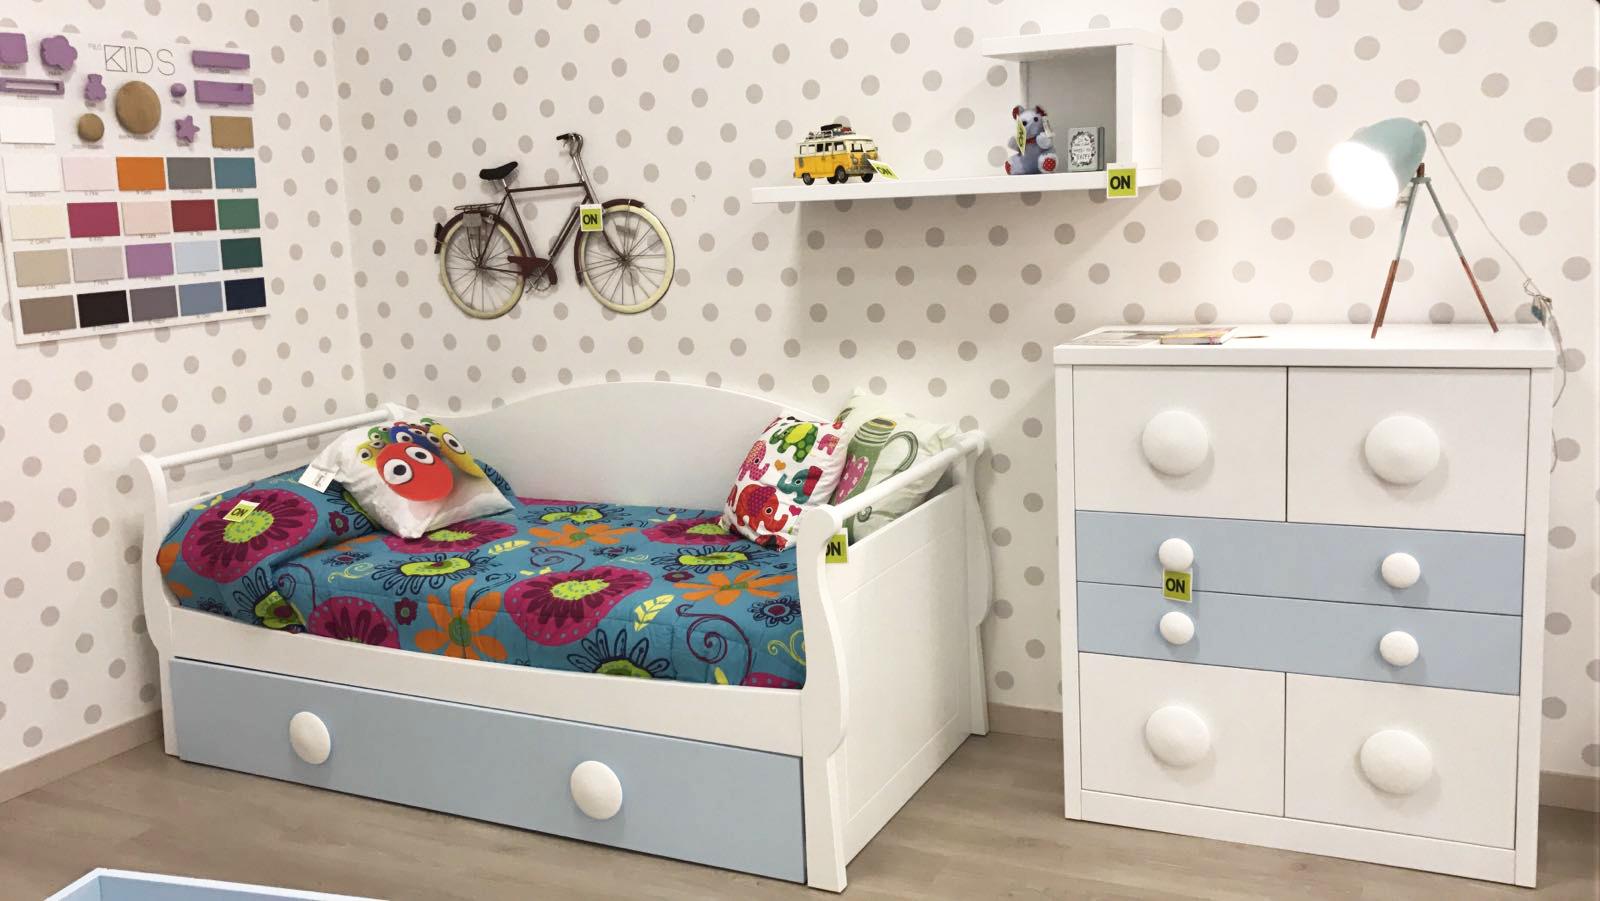 Mueble Juvenil On Home Muebles Y Decoraci N Online # Muebles Texturizados